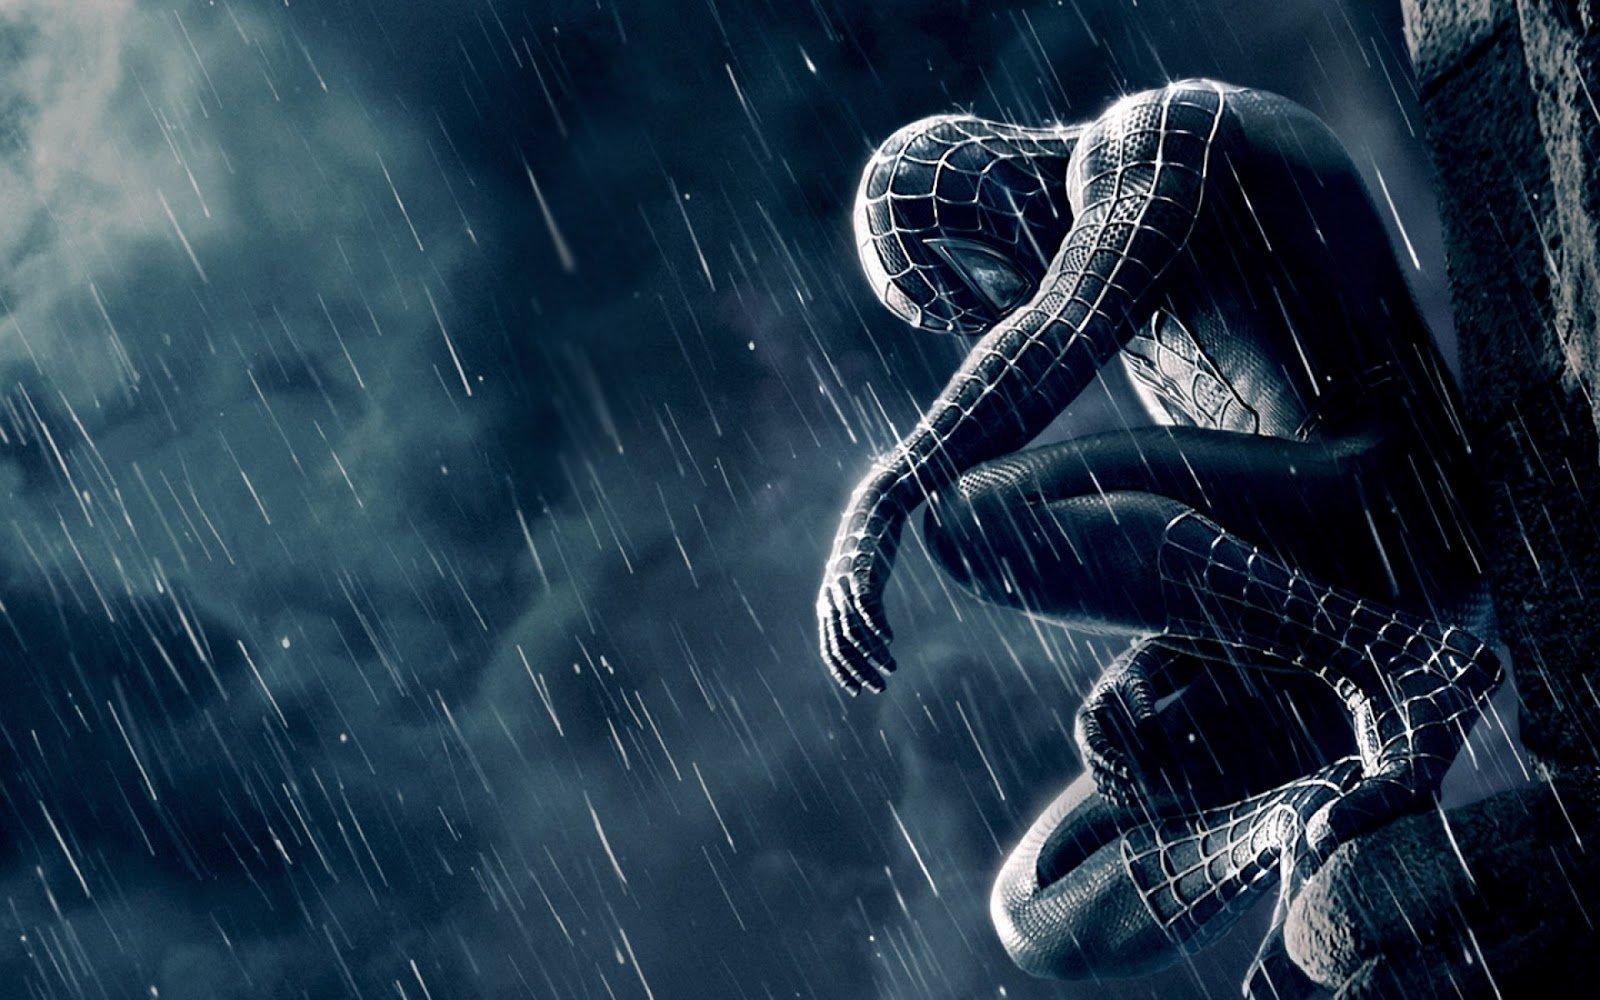 Hd wallpaper spiderman - Spider Man Hd Wallpapers 2013 2014 Hd Wallpapers